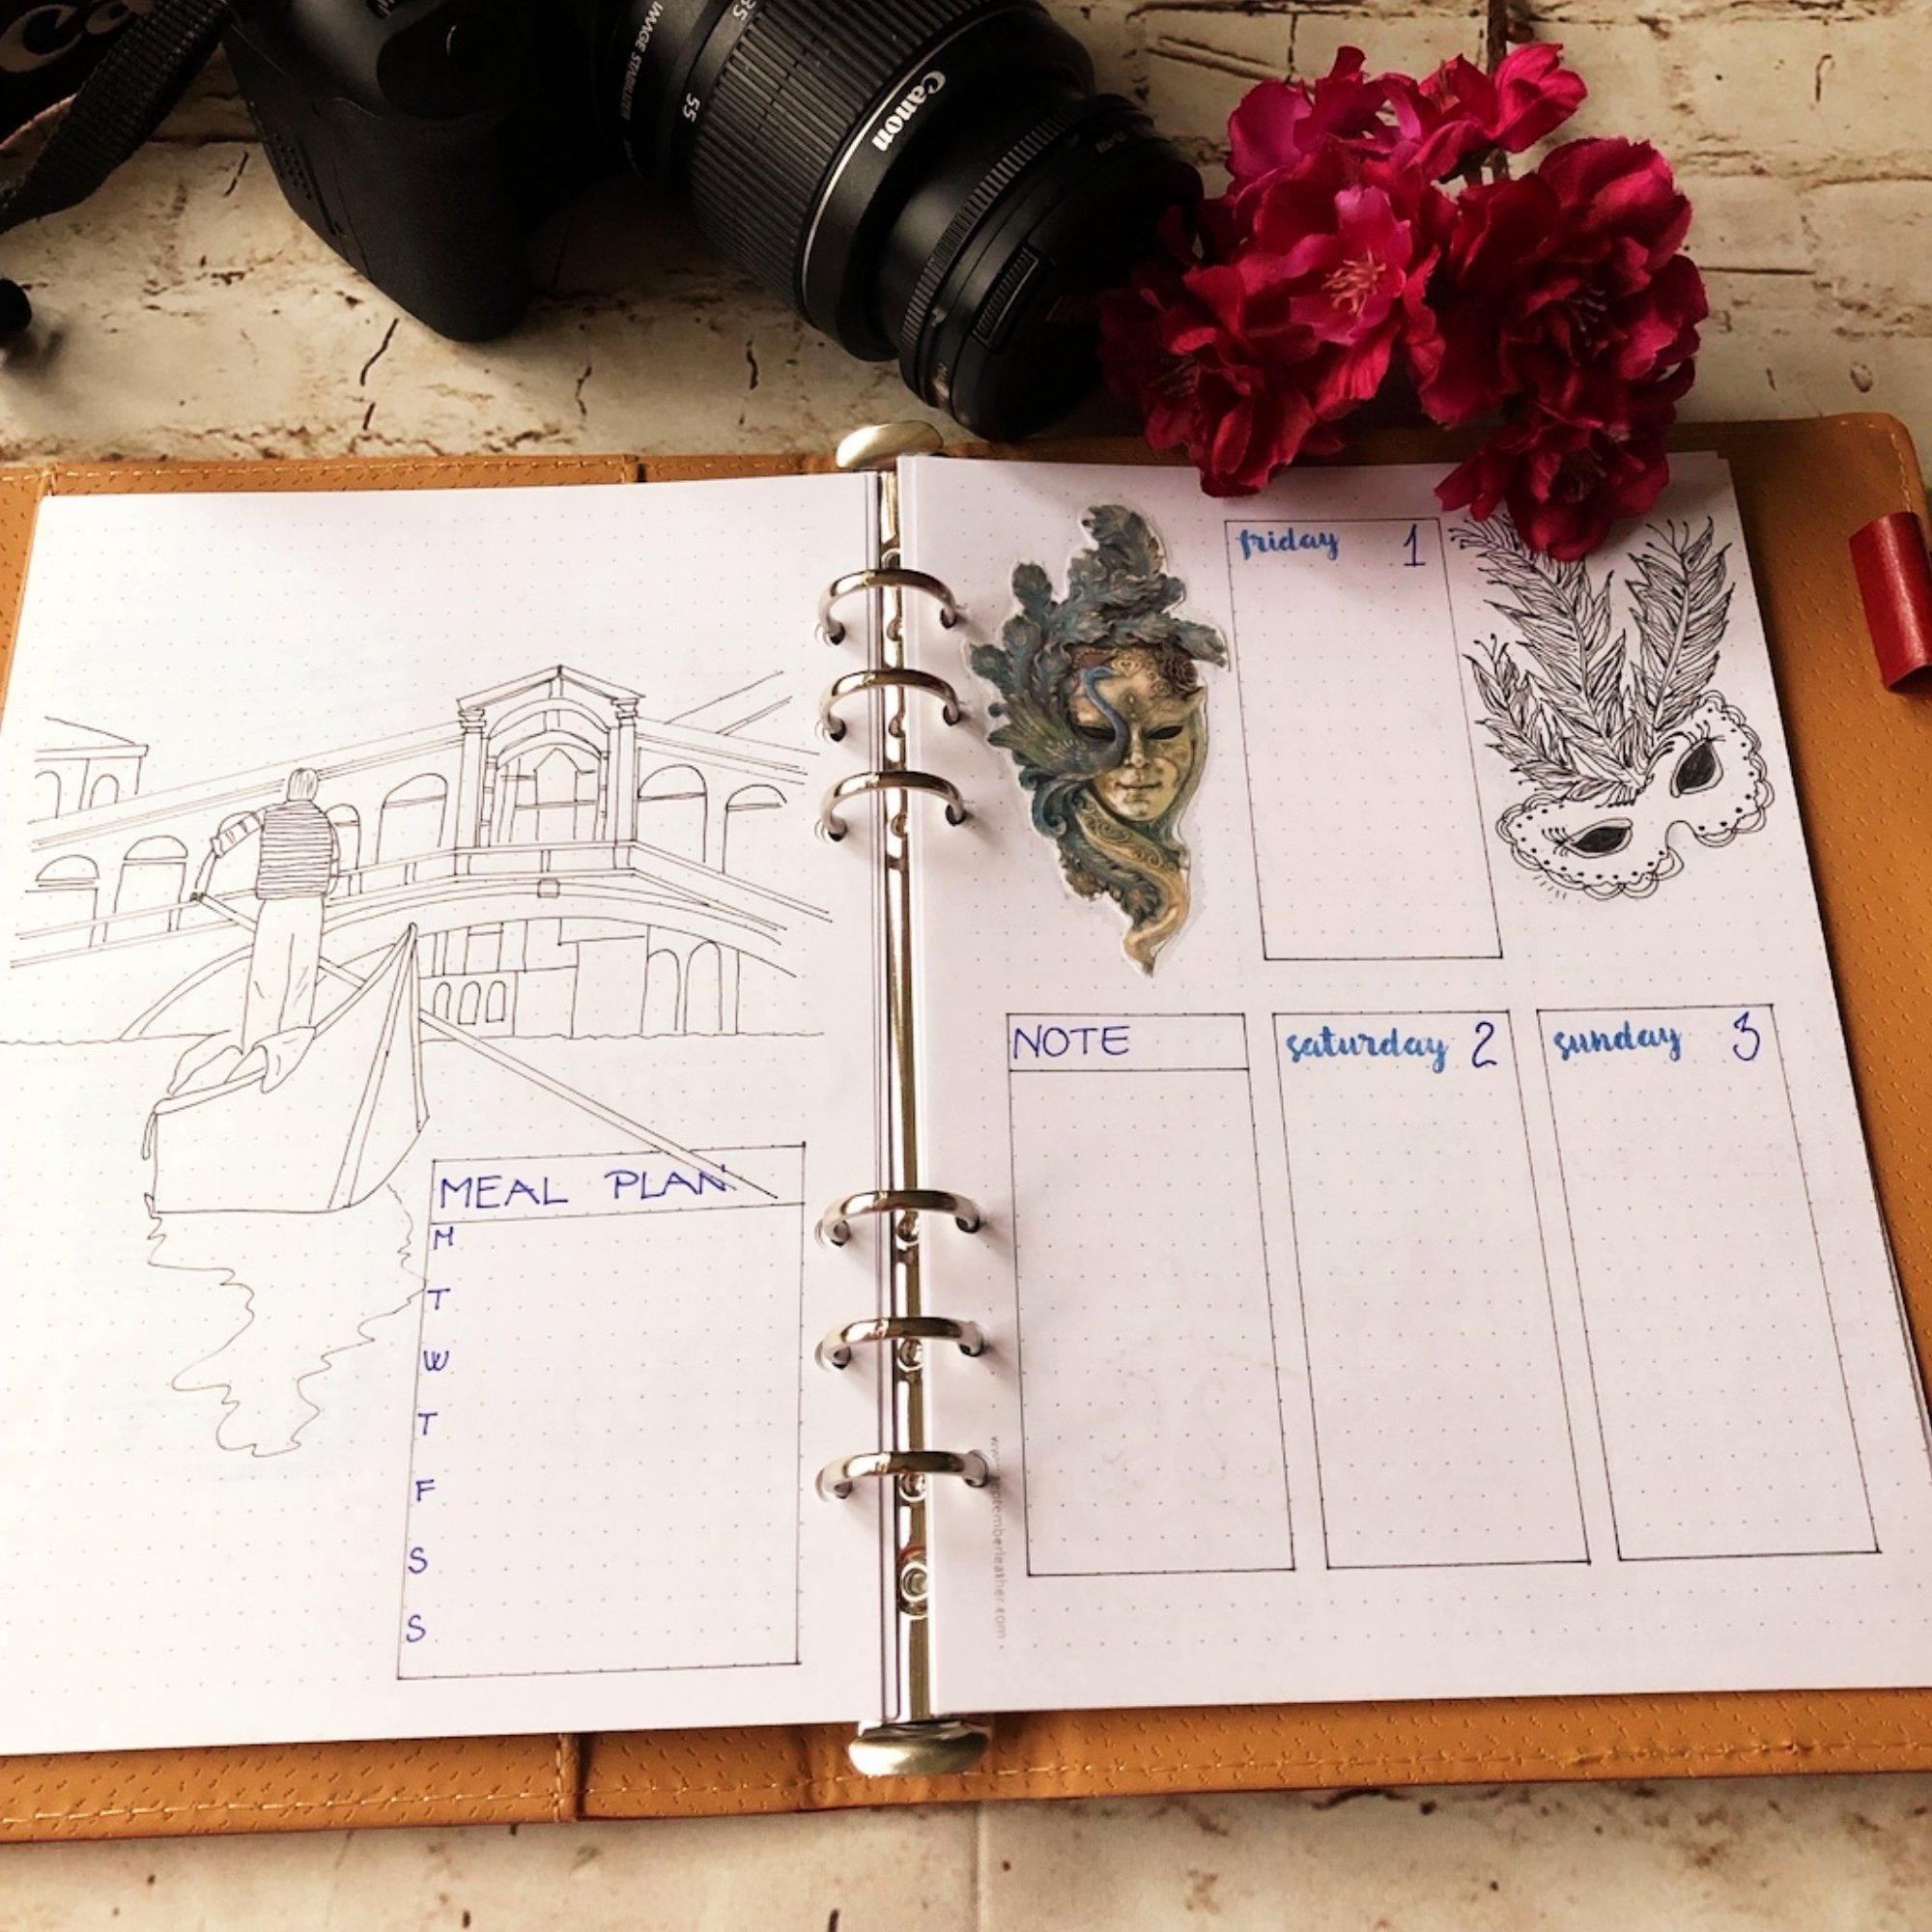 Creative journaling weekly planner - week 5 - itstartswithacoffee.com #creativejournaling #bulletjournaling #planner #weeklyplanner #weekly #February #2019 #week5